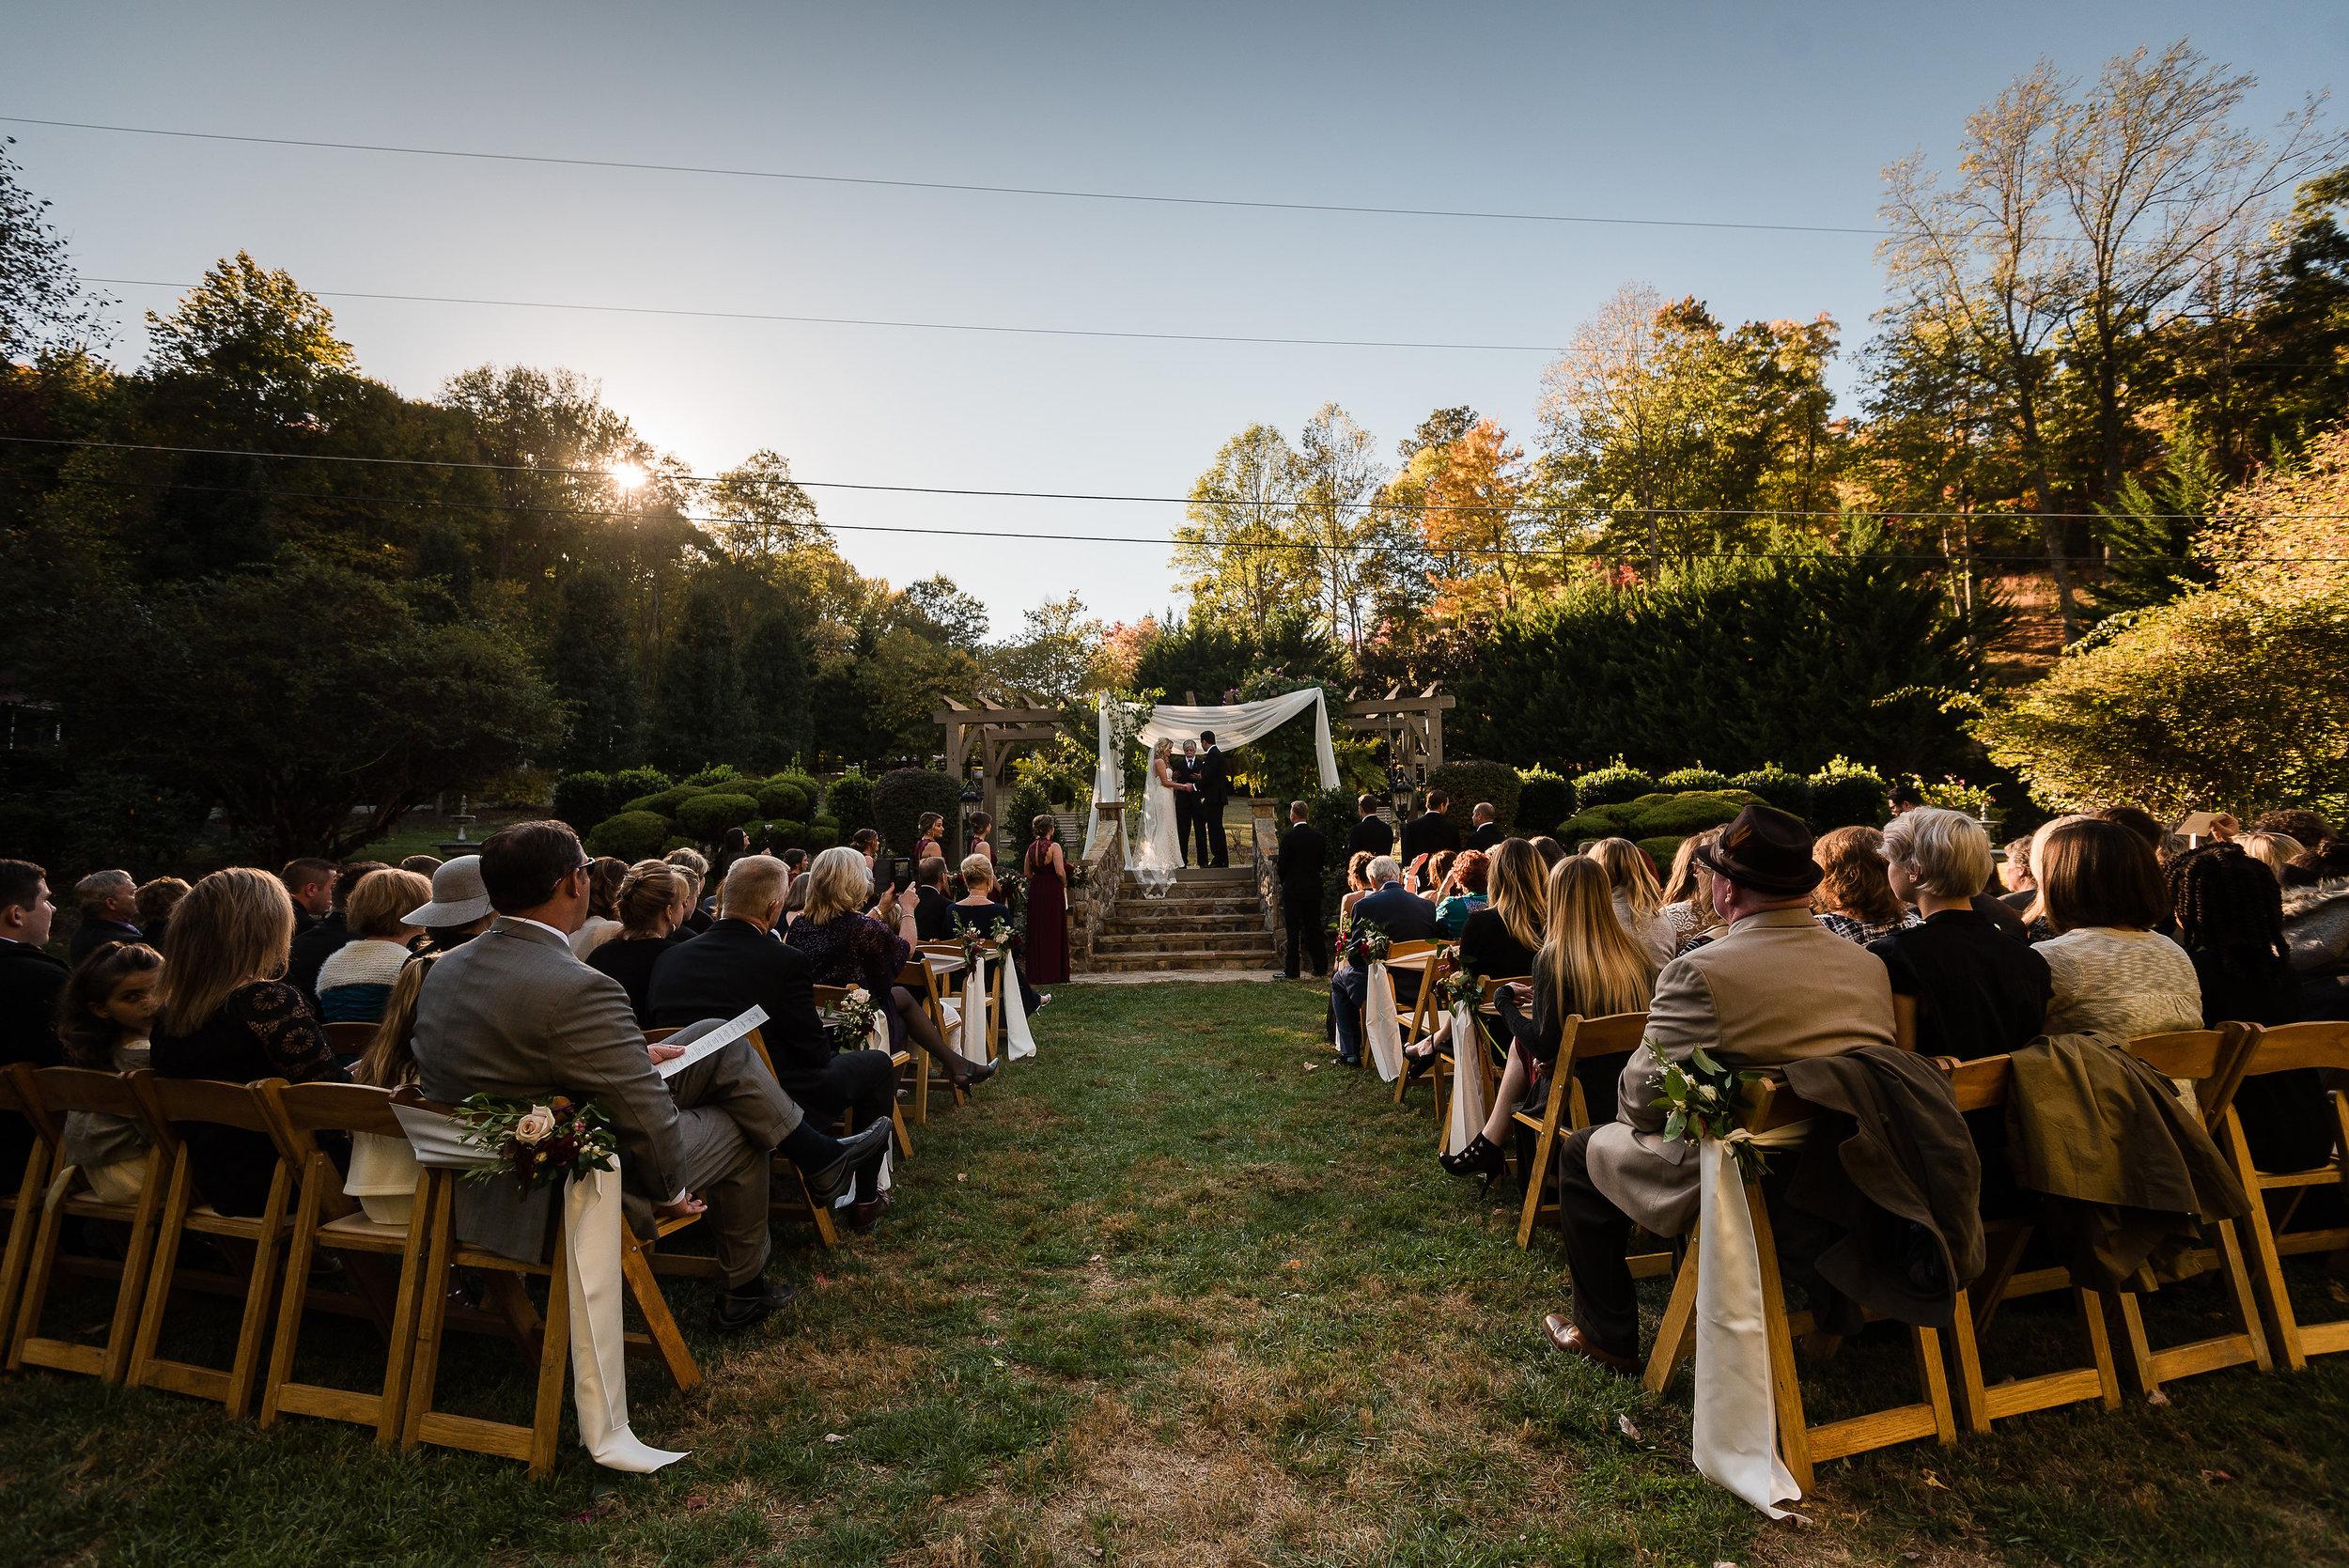 20161022_hawkesdene_fall_wedding_photos_0917.jpg